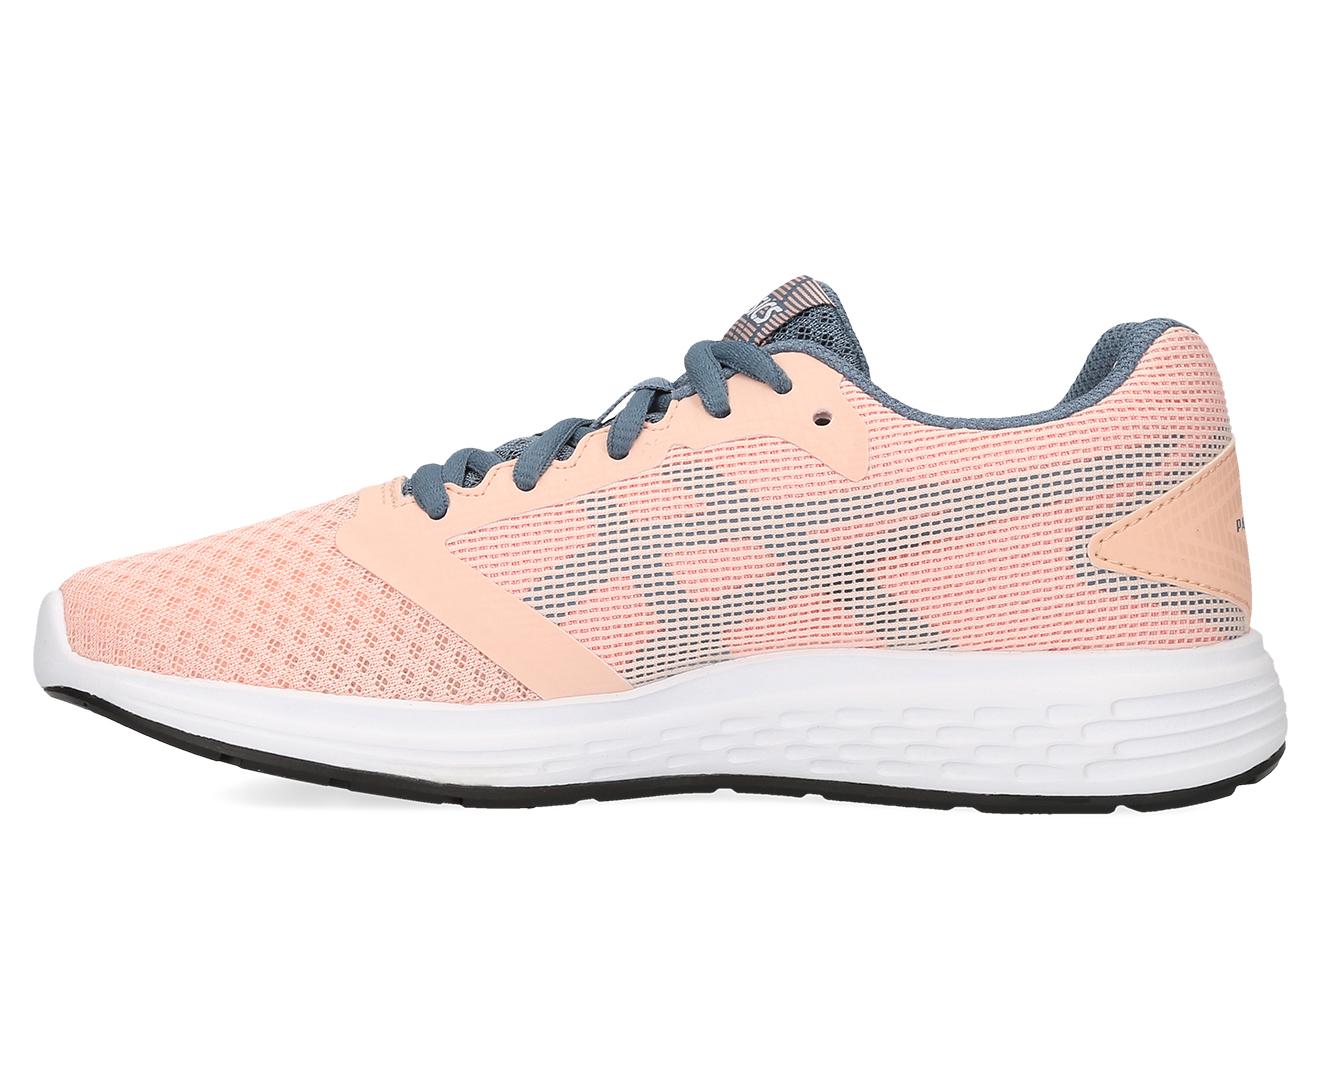 5d143bbeb0 Details about ASICS Grade-School Girls' Patriot 10 Shoe - Baked Pink/Steel  Blue